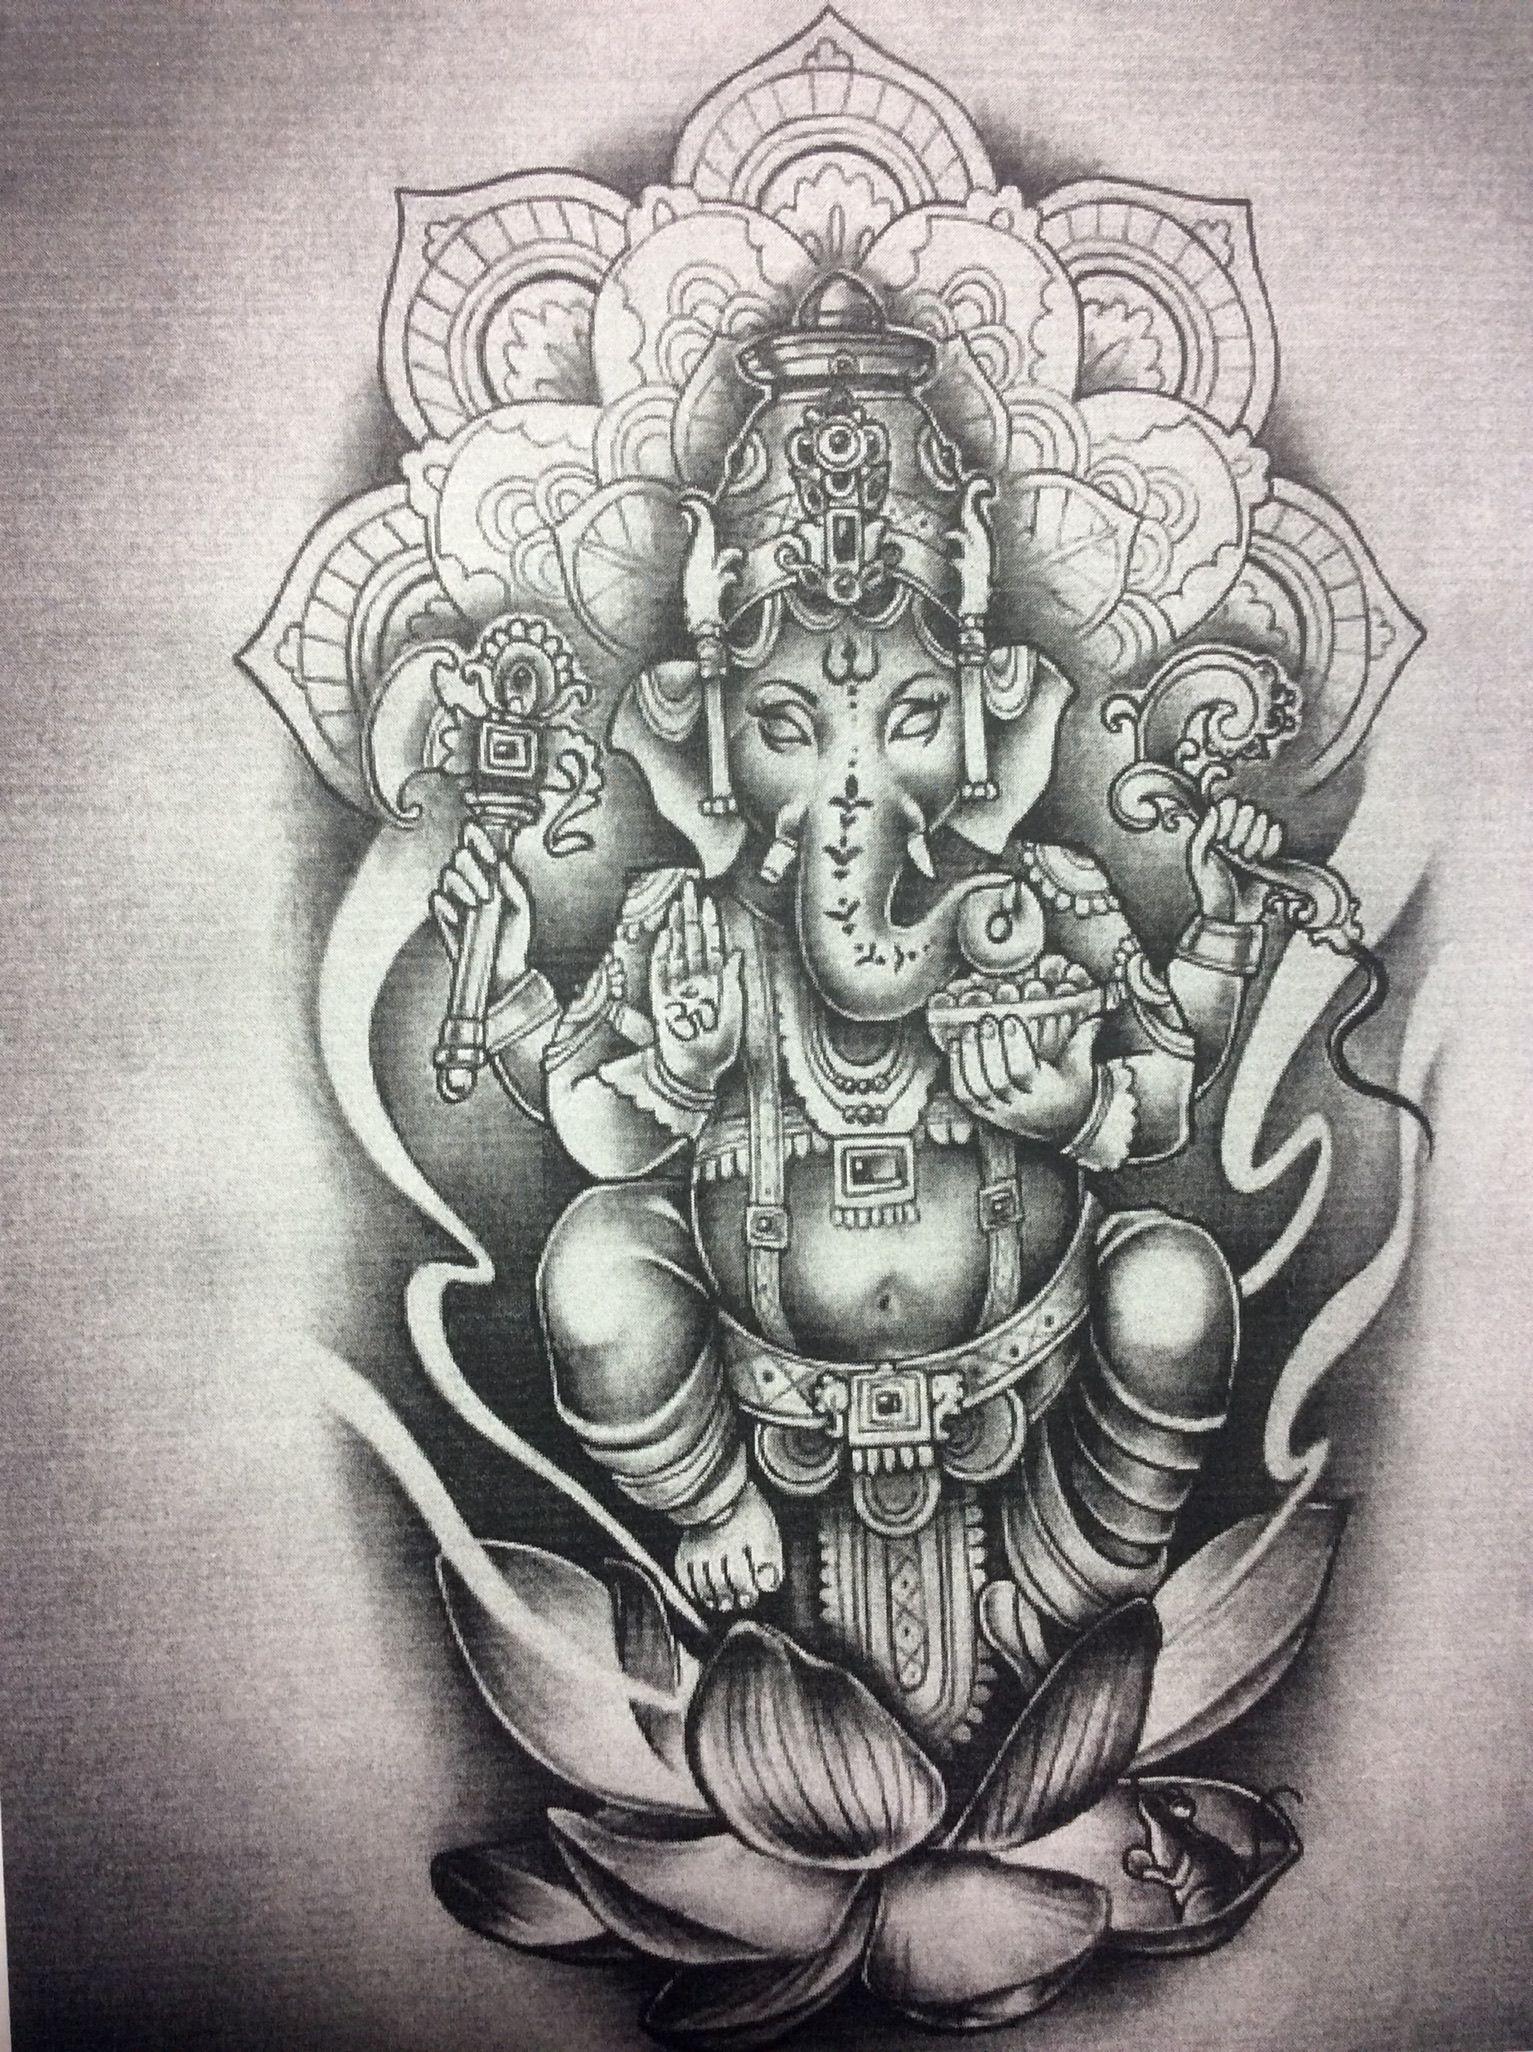 Pin By Annel Roldan On Dani S World Ganesha Tattoo Elephant Tattoos Ganesh Tattoo